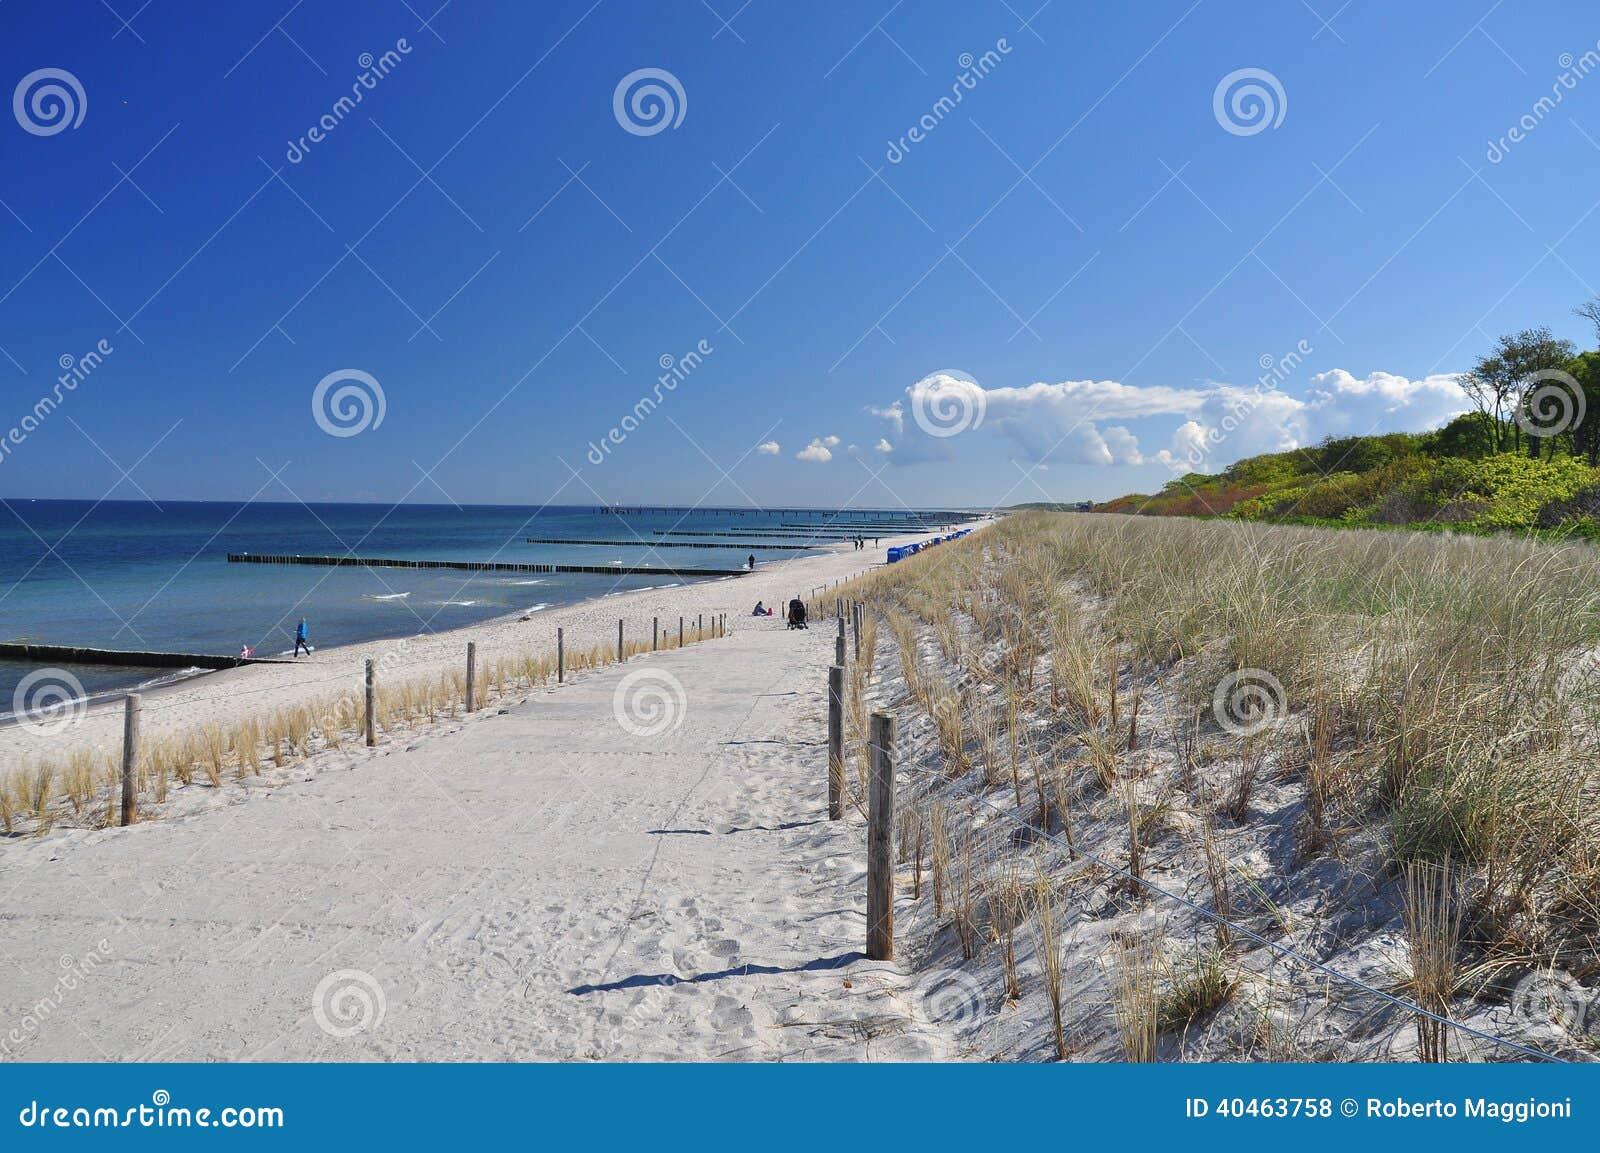 German beach and blue sky, Fischland Darss, Baltic